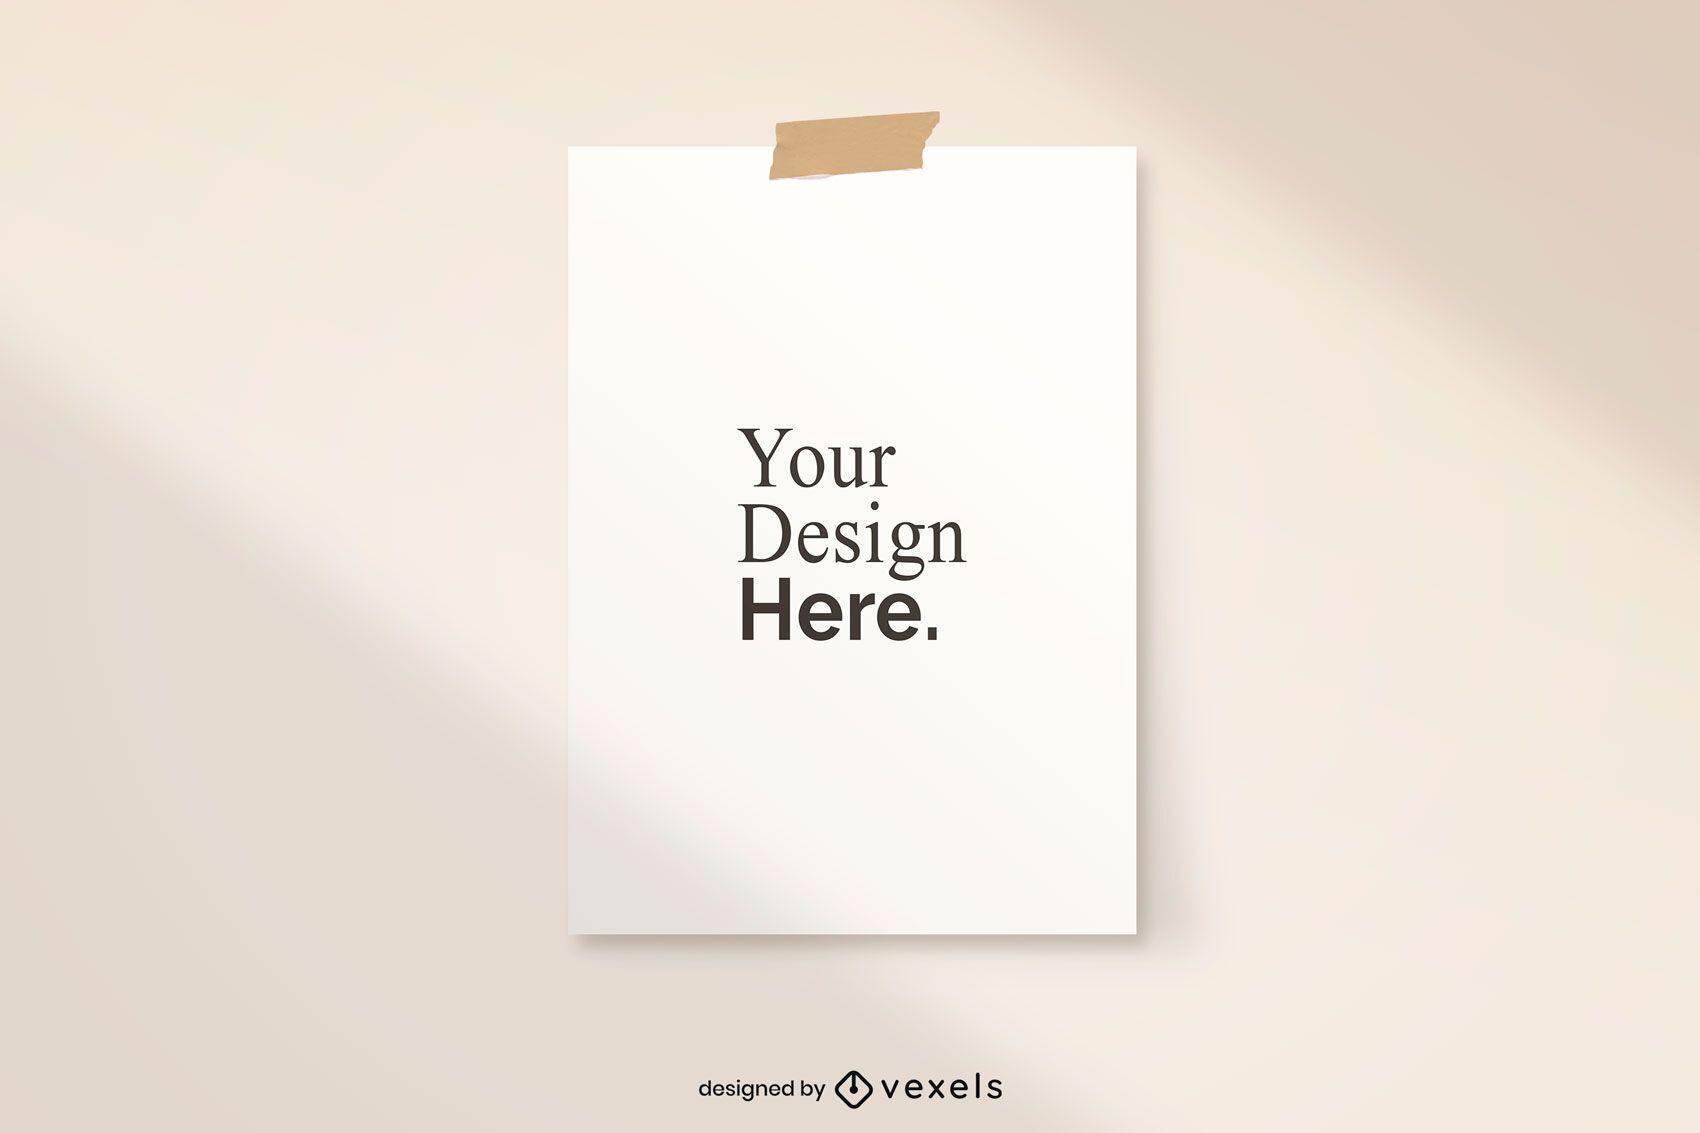 Taped poster mockup design